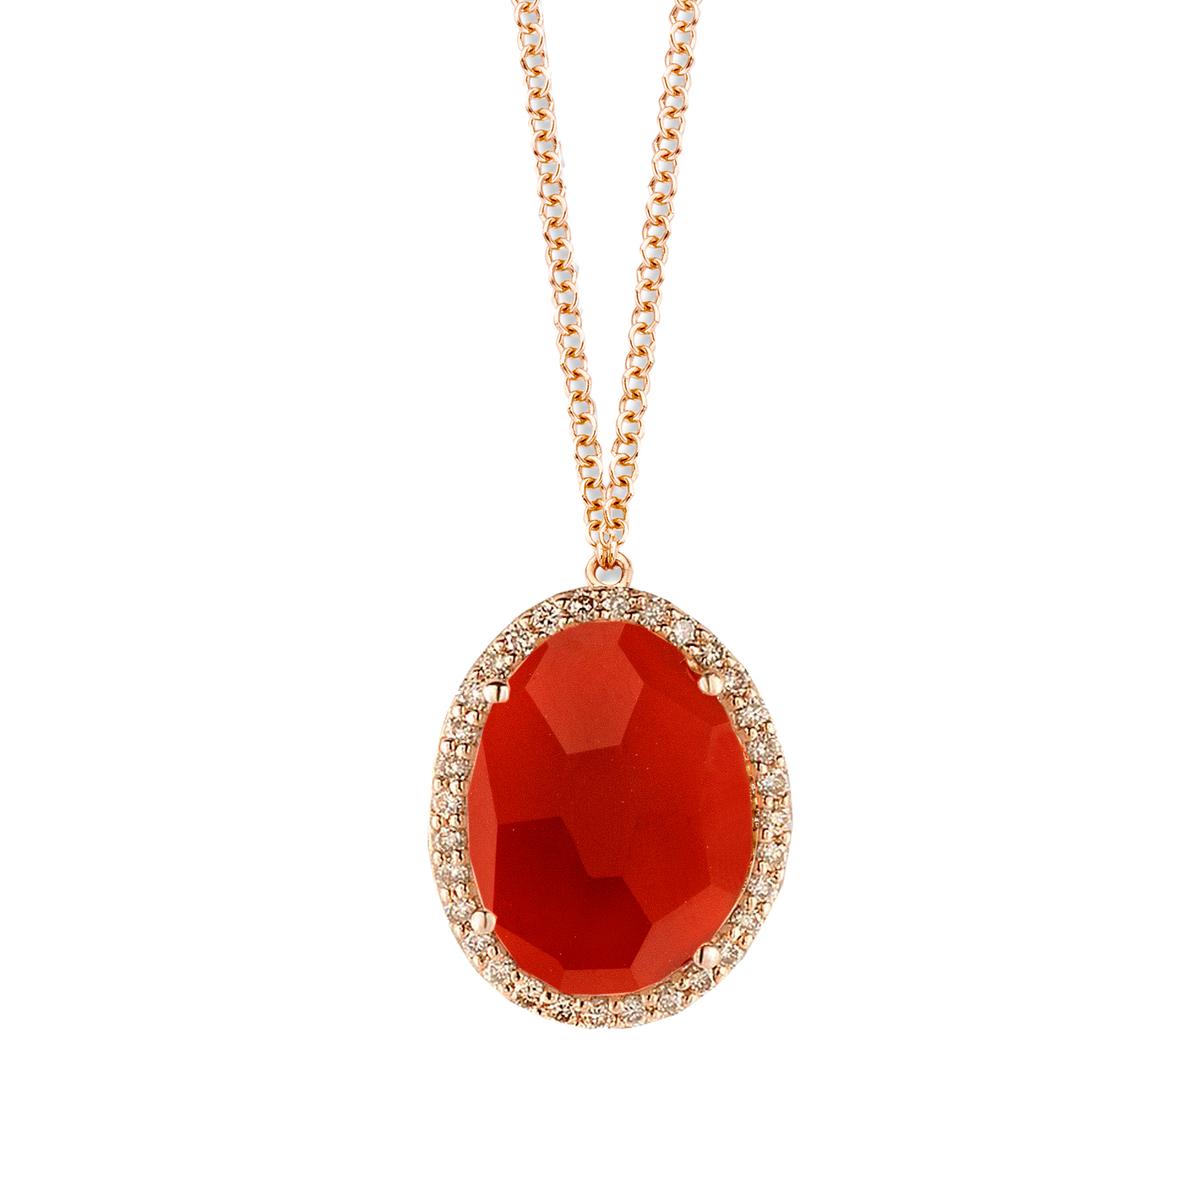 stromboli necklace in rose gold